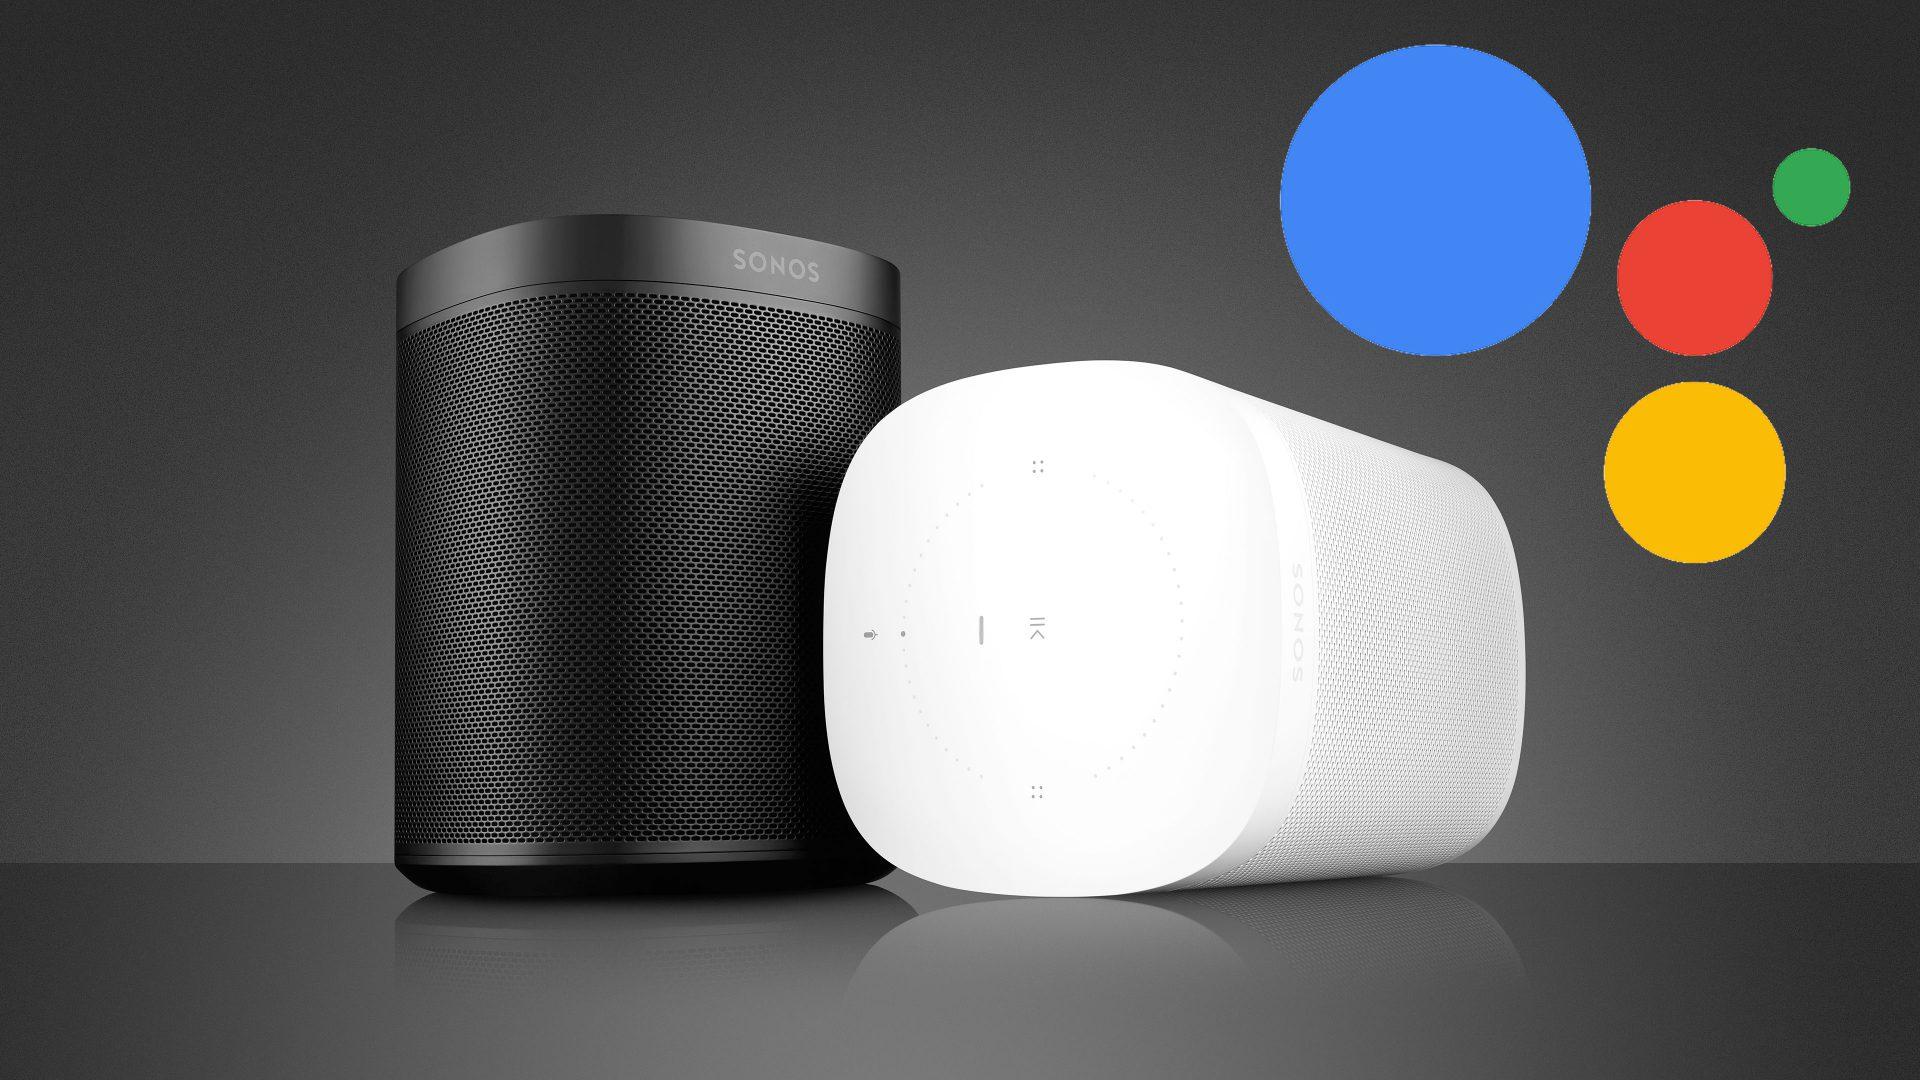 Sonos One Google Assistant